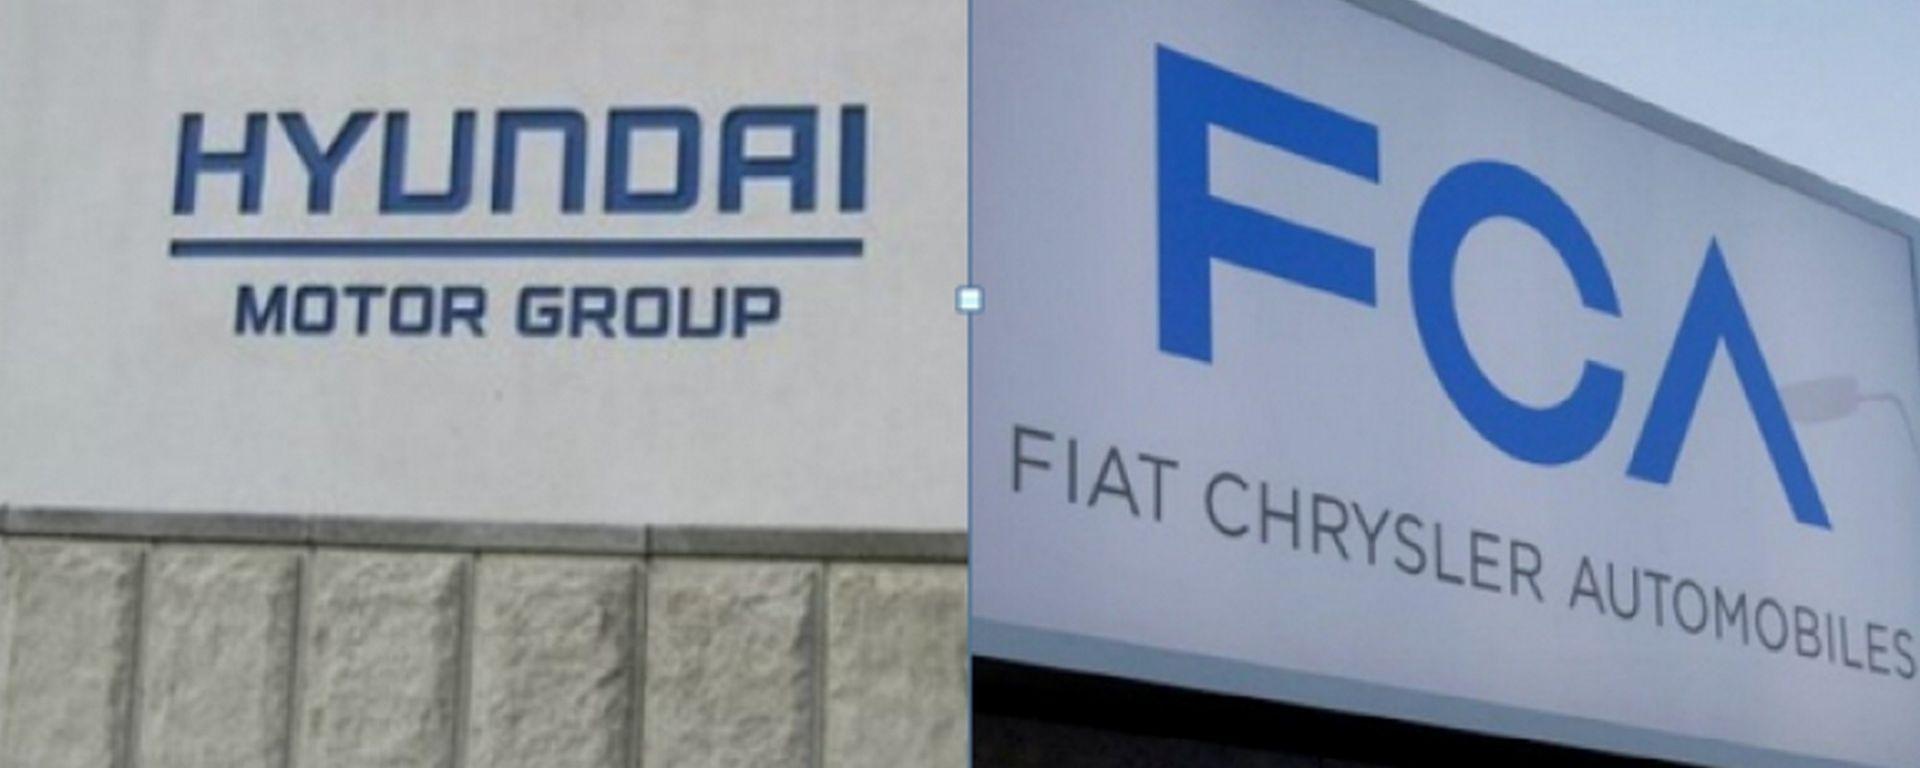 Hyundai potrebbe essere interessata a FCA